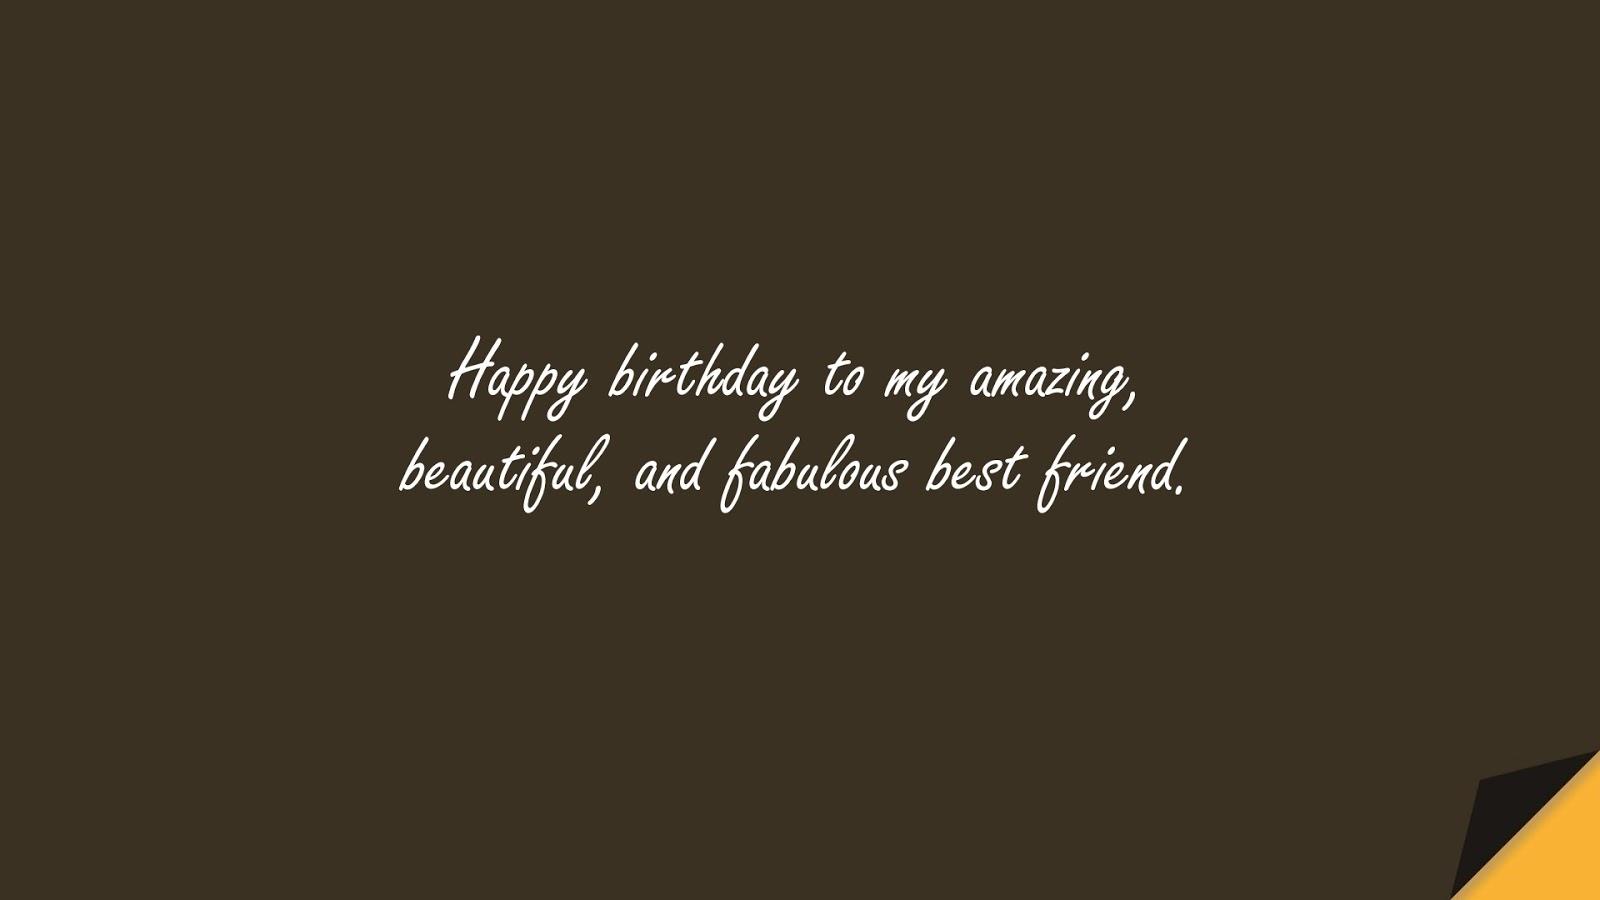 Happy birthday to my amazing, beautiful, and fabulous best friend.FALSE